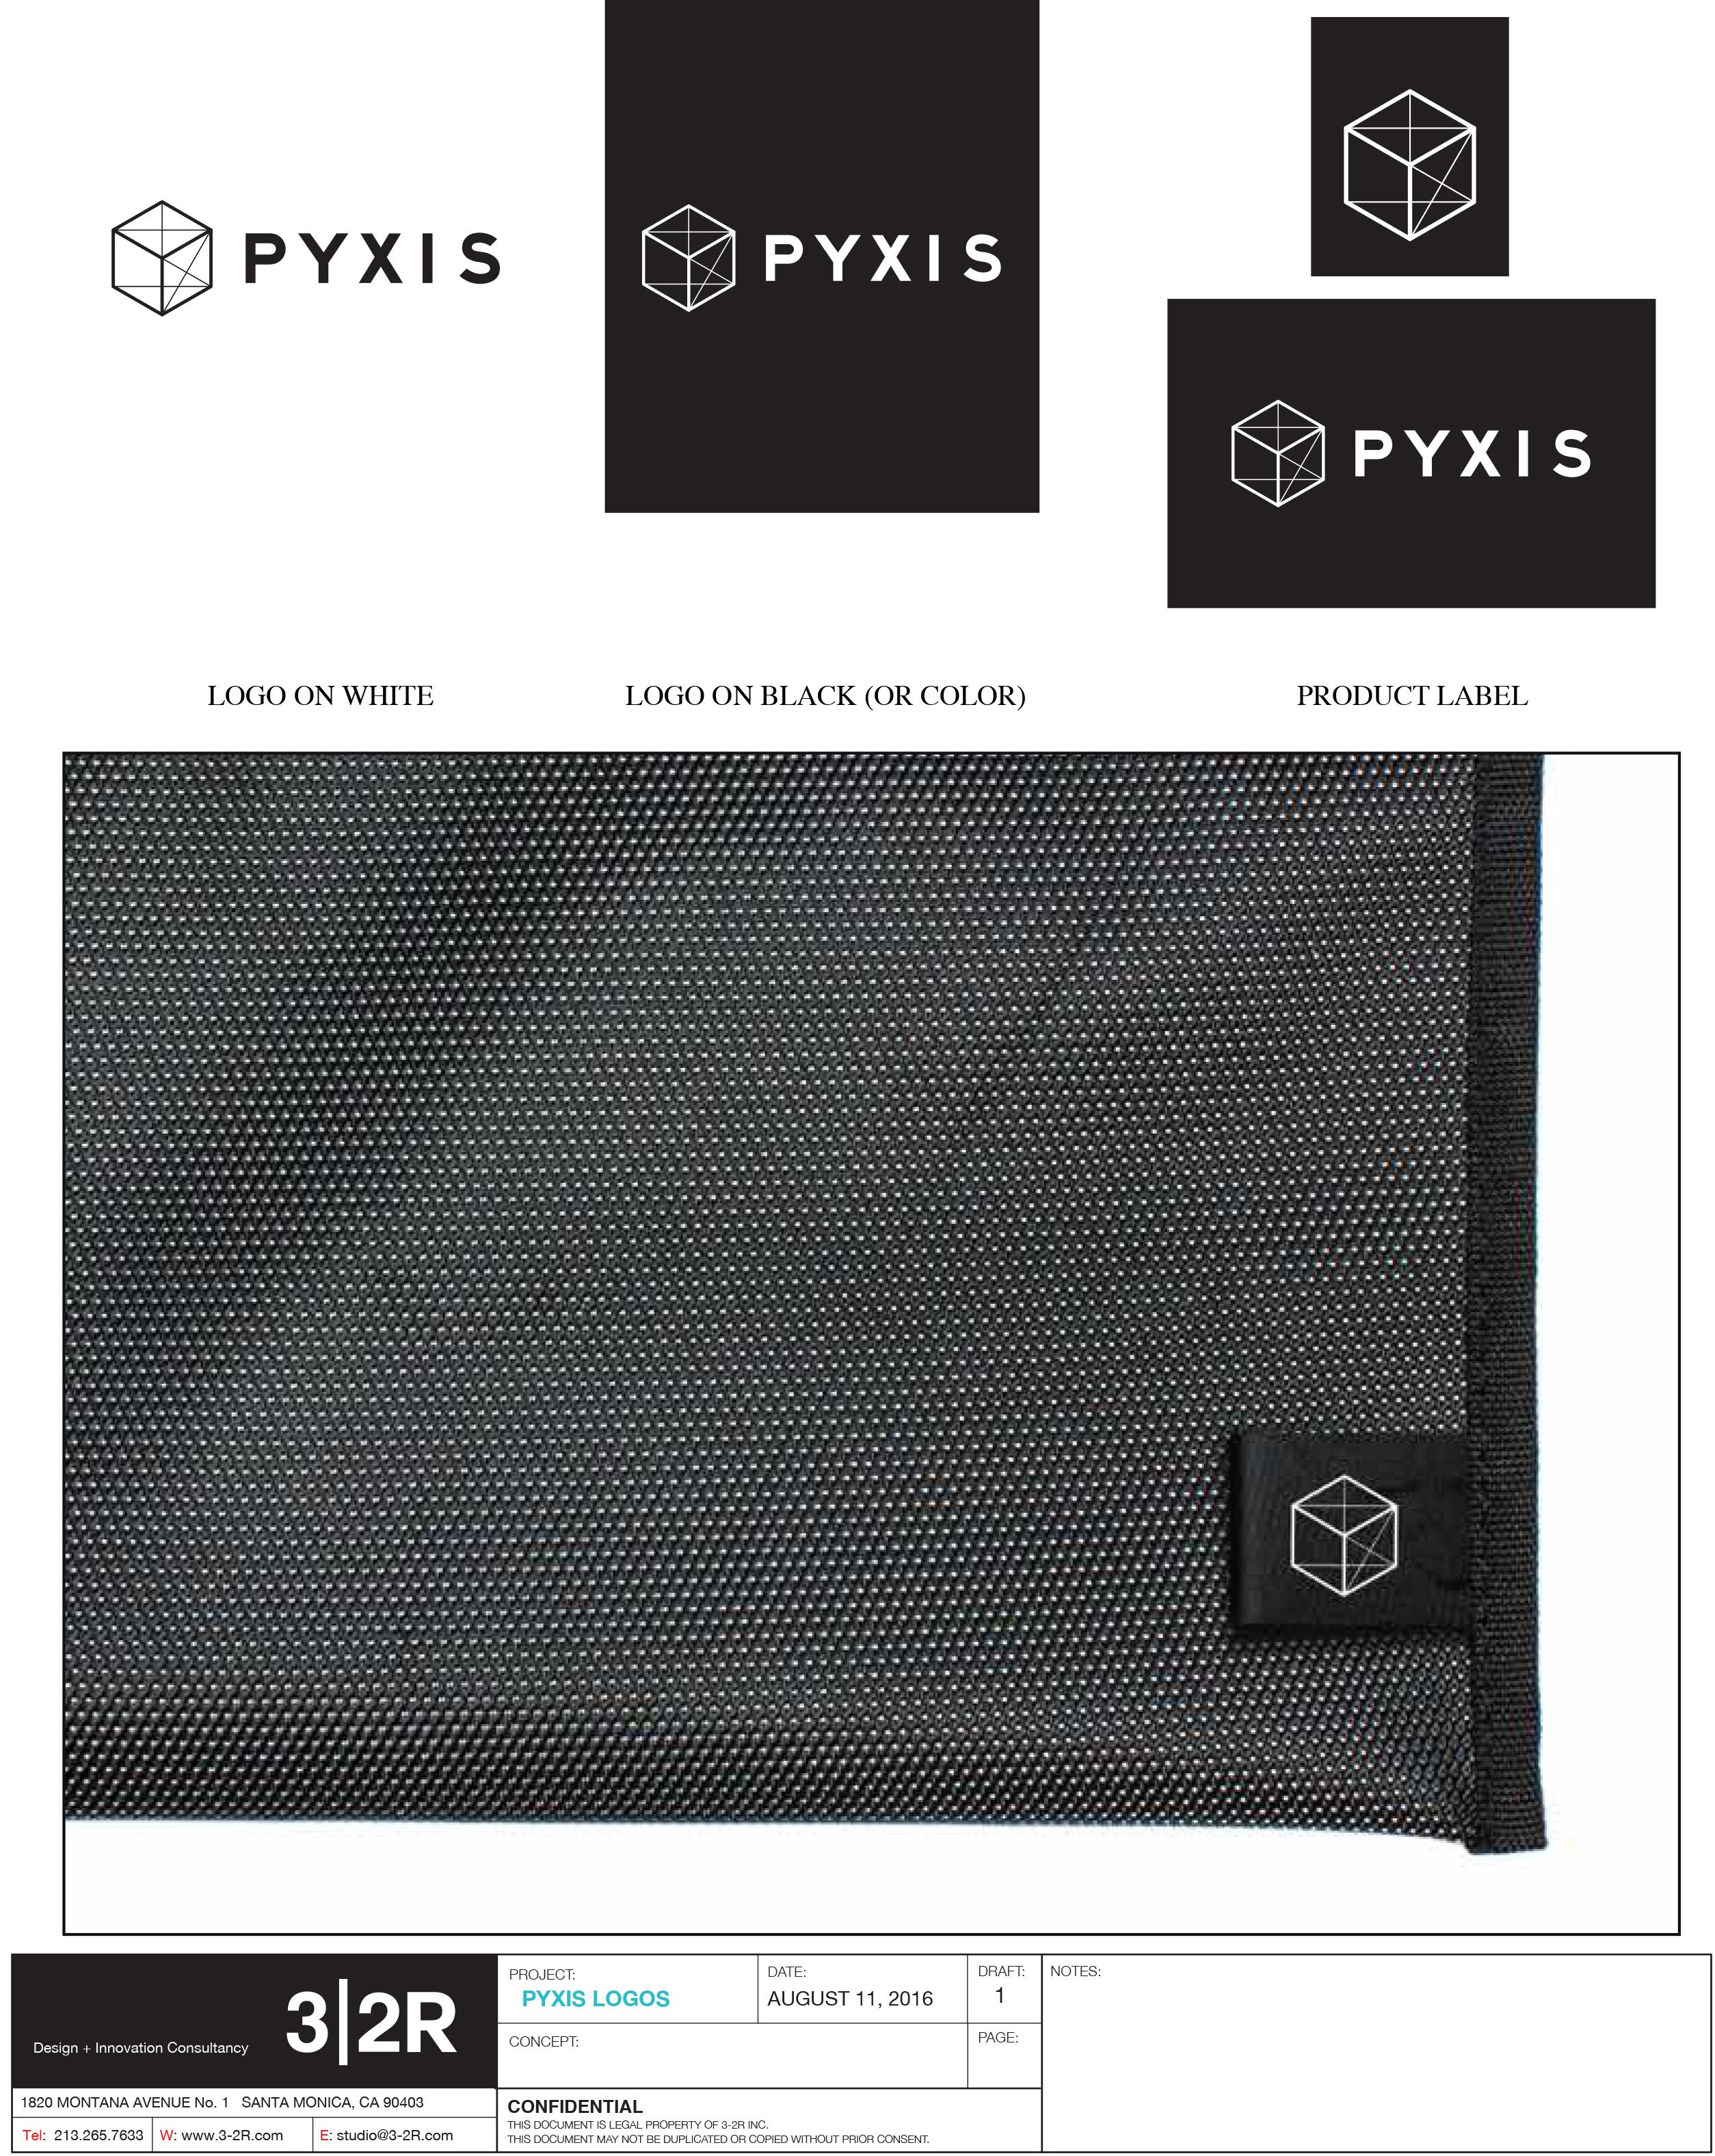 PYXIS Logo Design